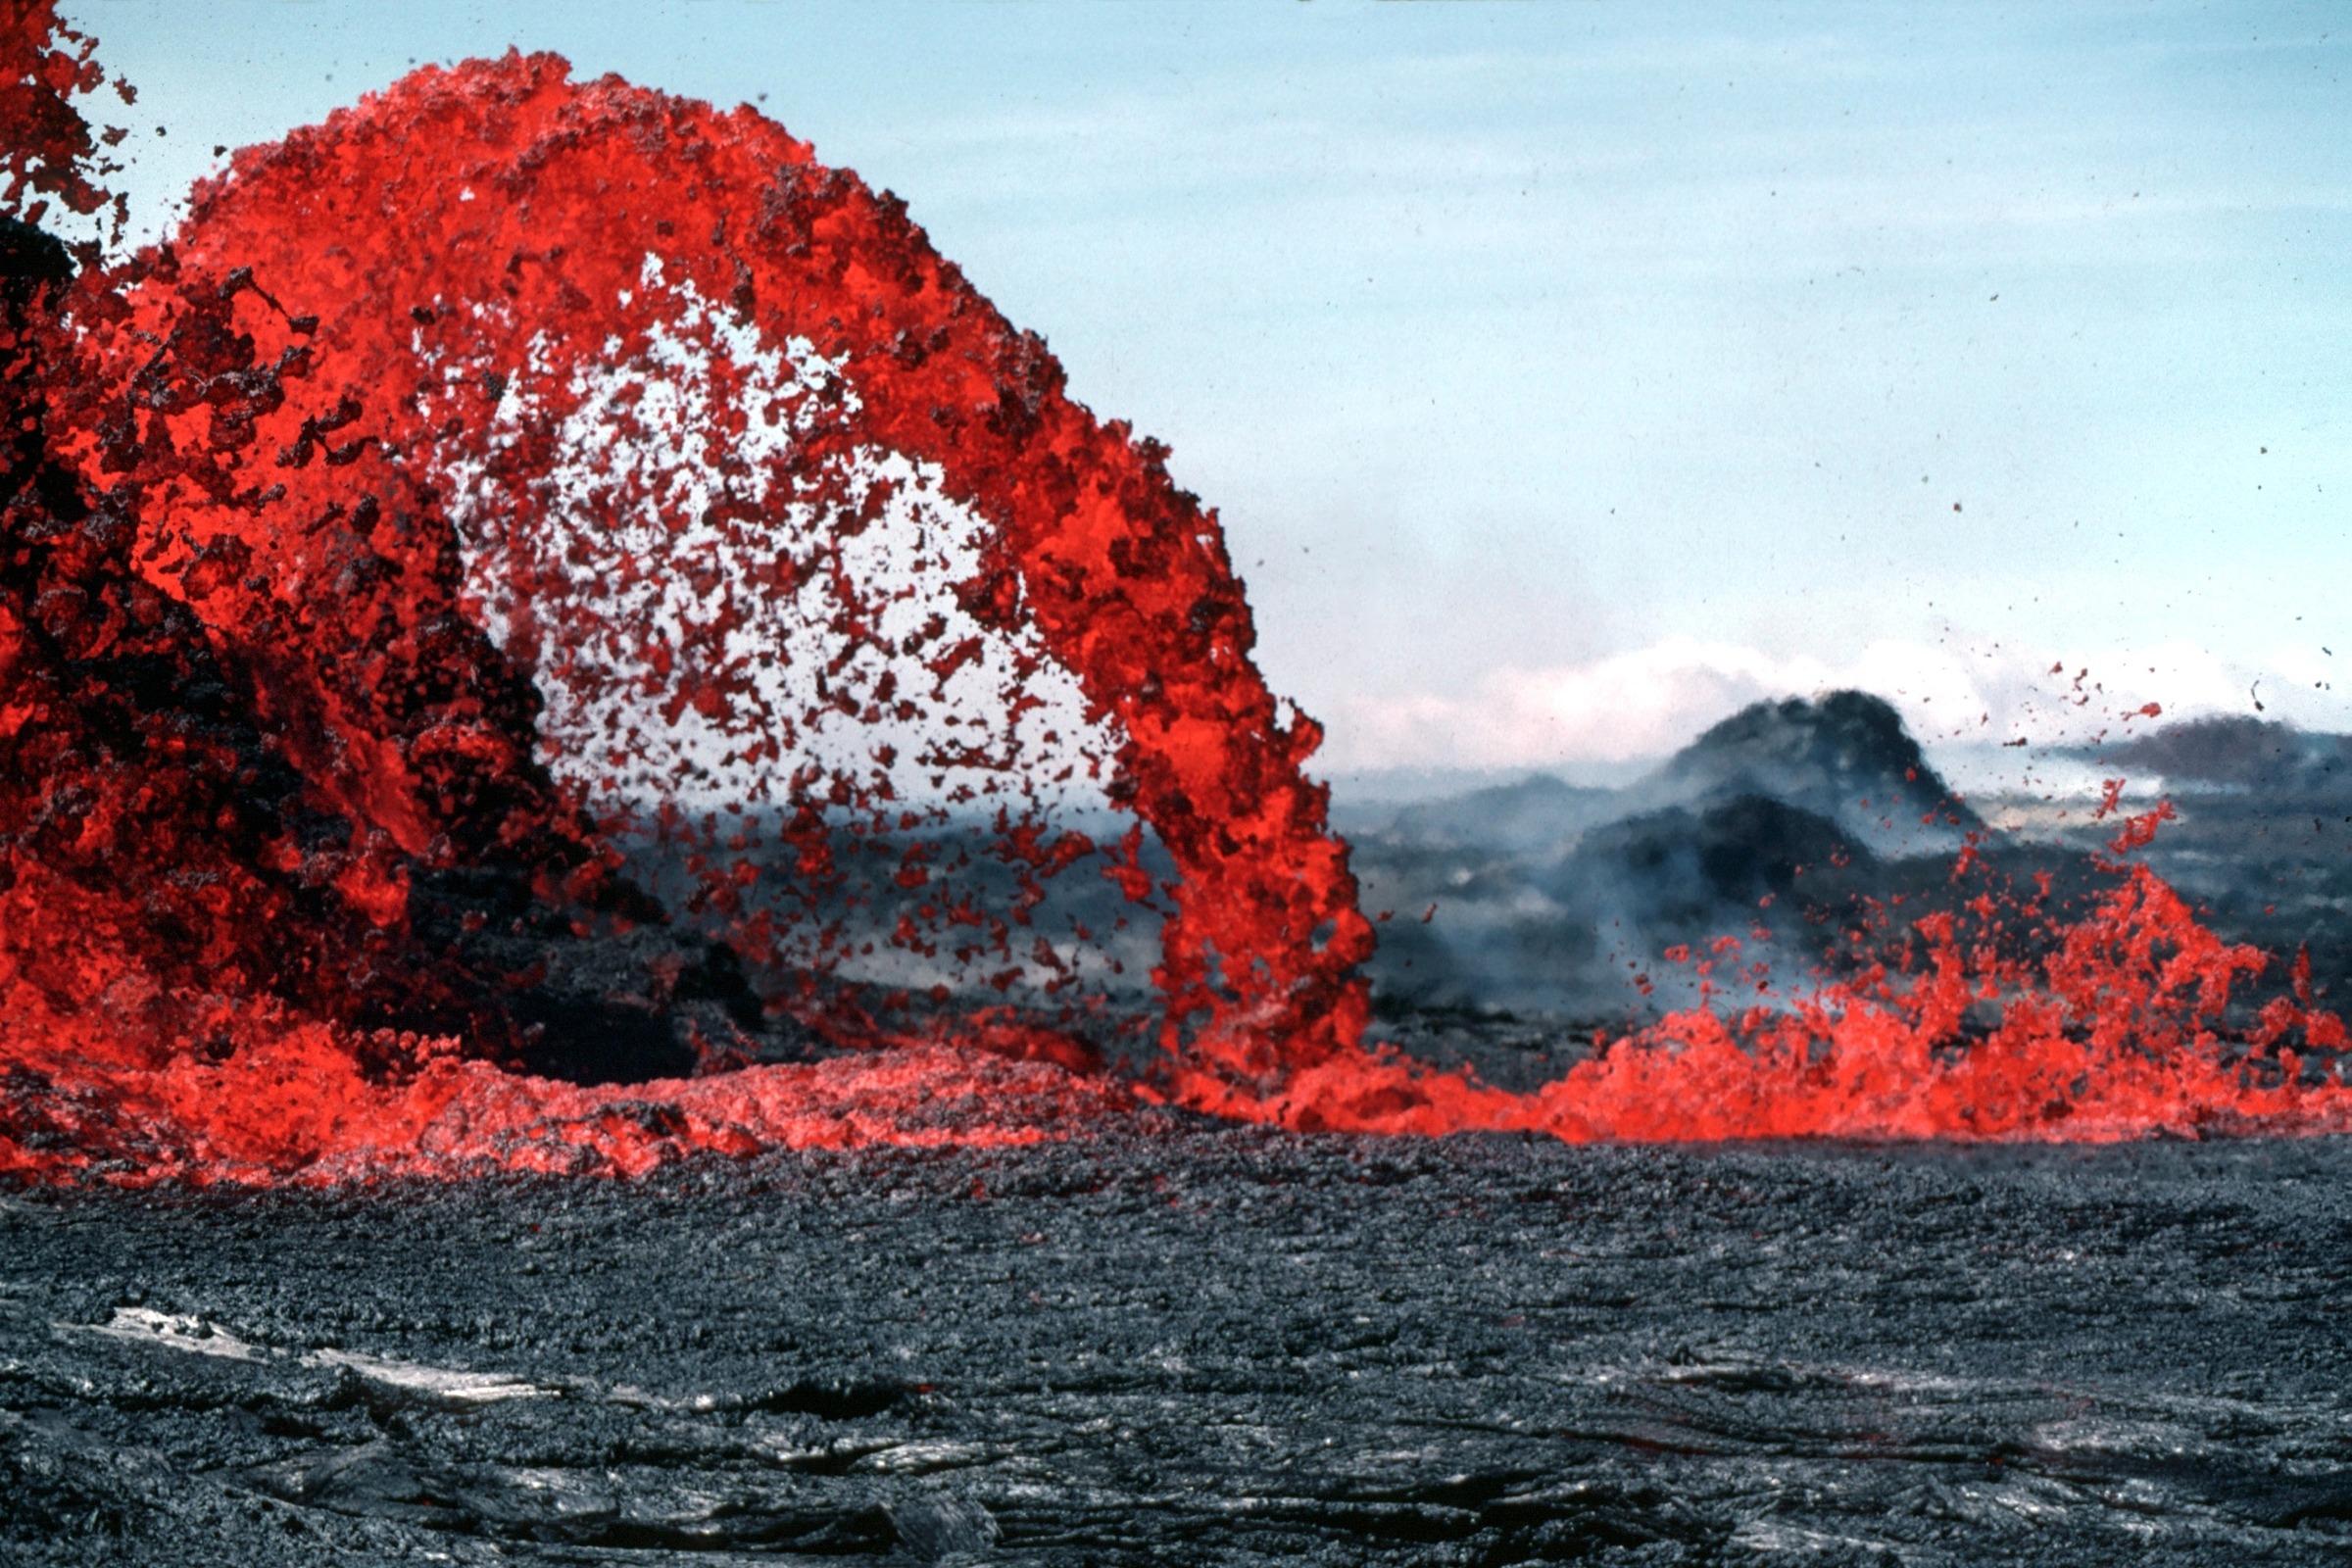 lava-magma-volcanic-eruption-glow-73830.jpeg